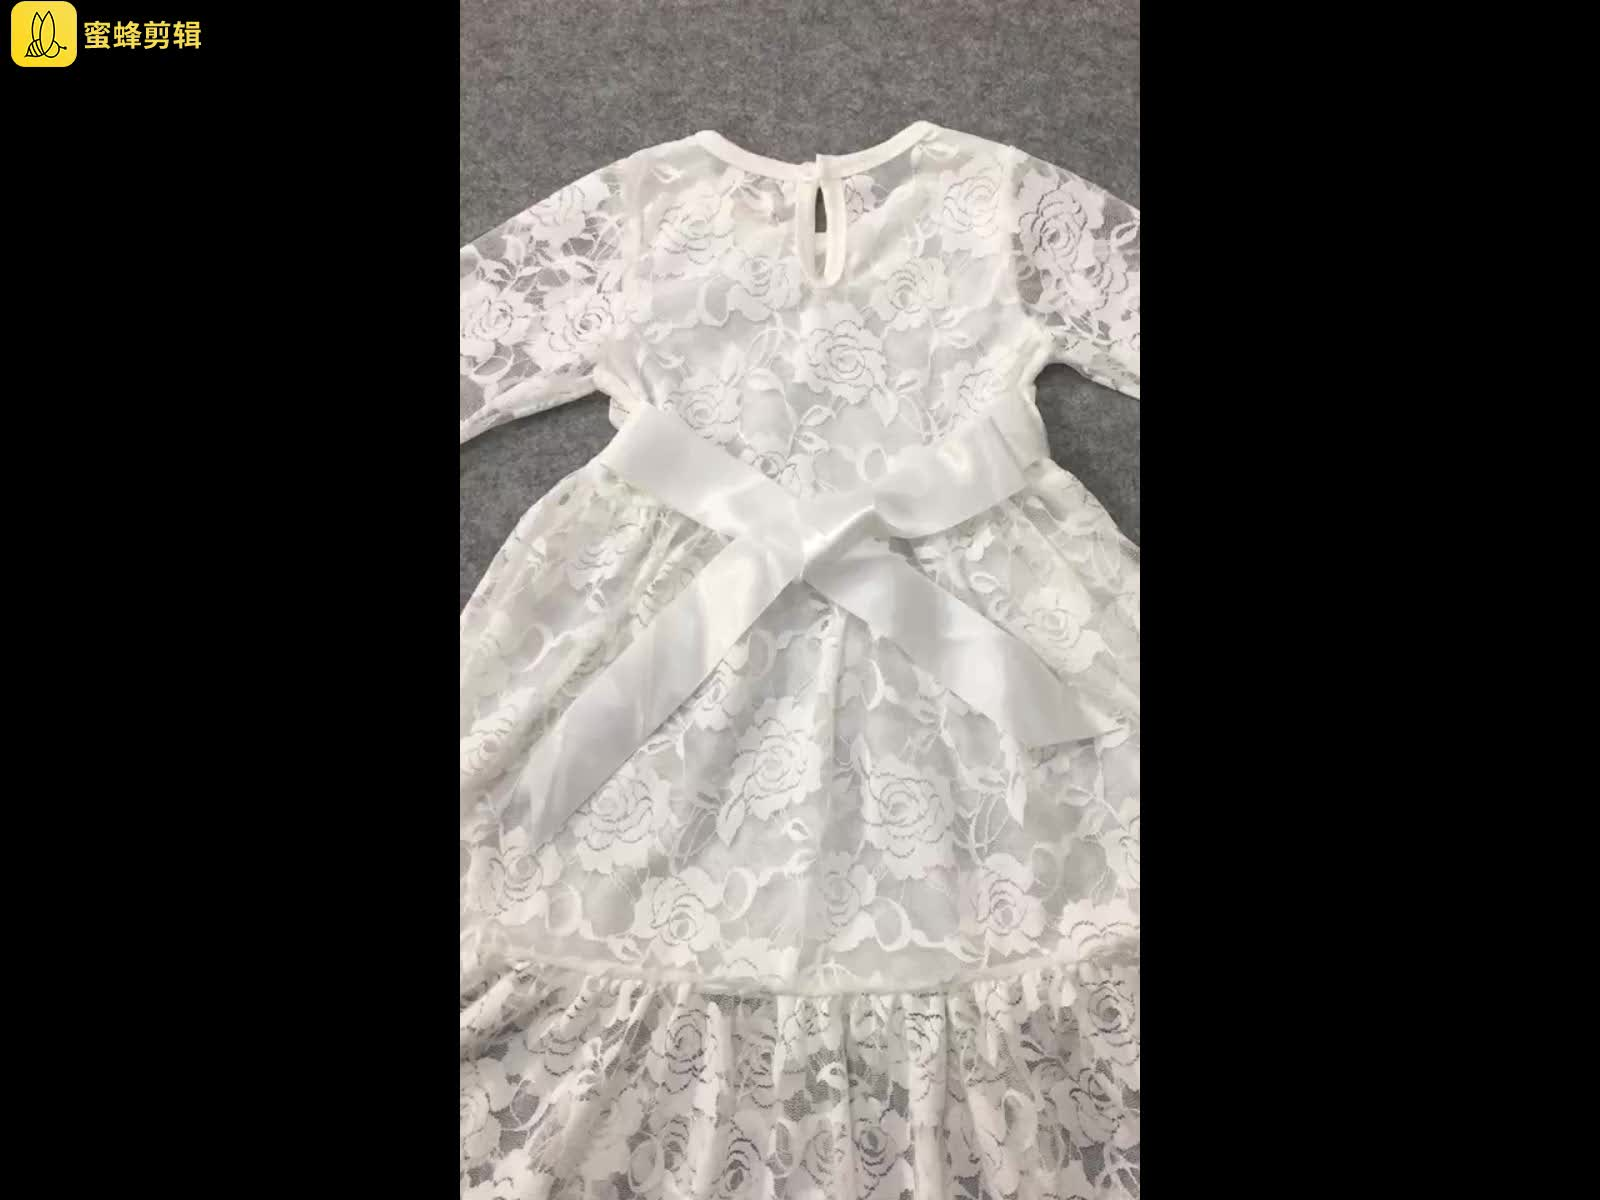 2018 Wholesale Children white Dress Wedding flower girl dresses Long Sleeves Lace girls party dresses